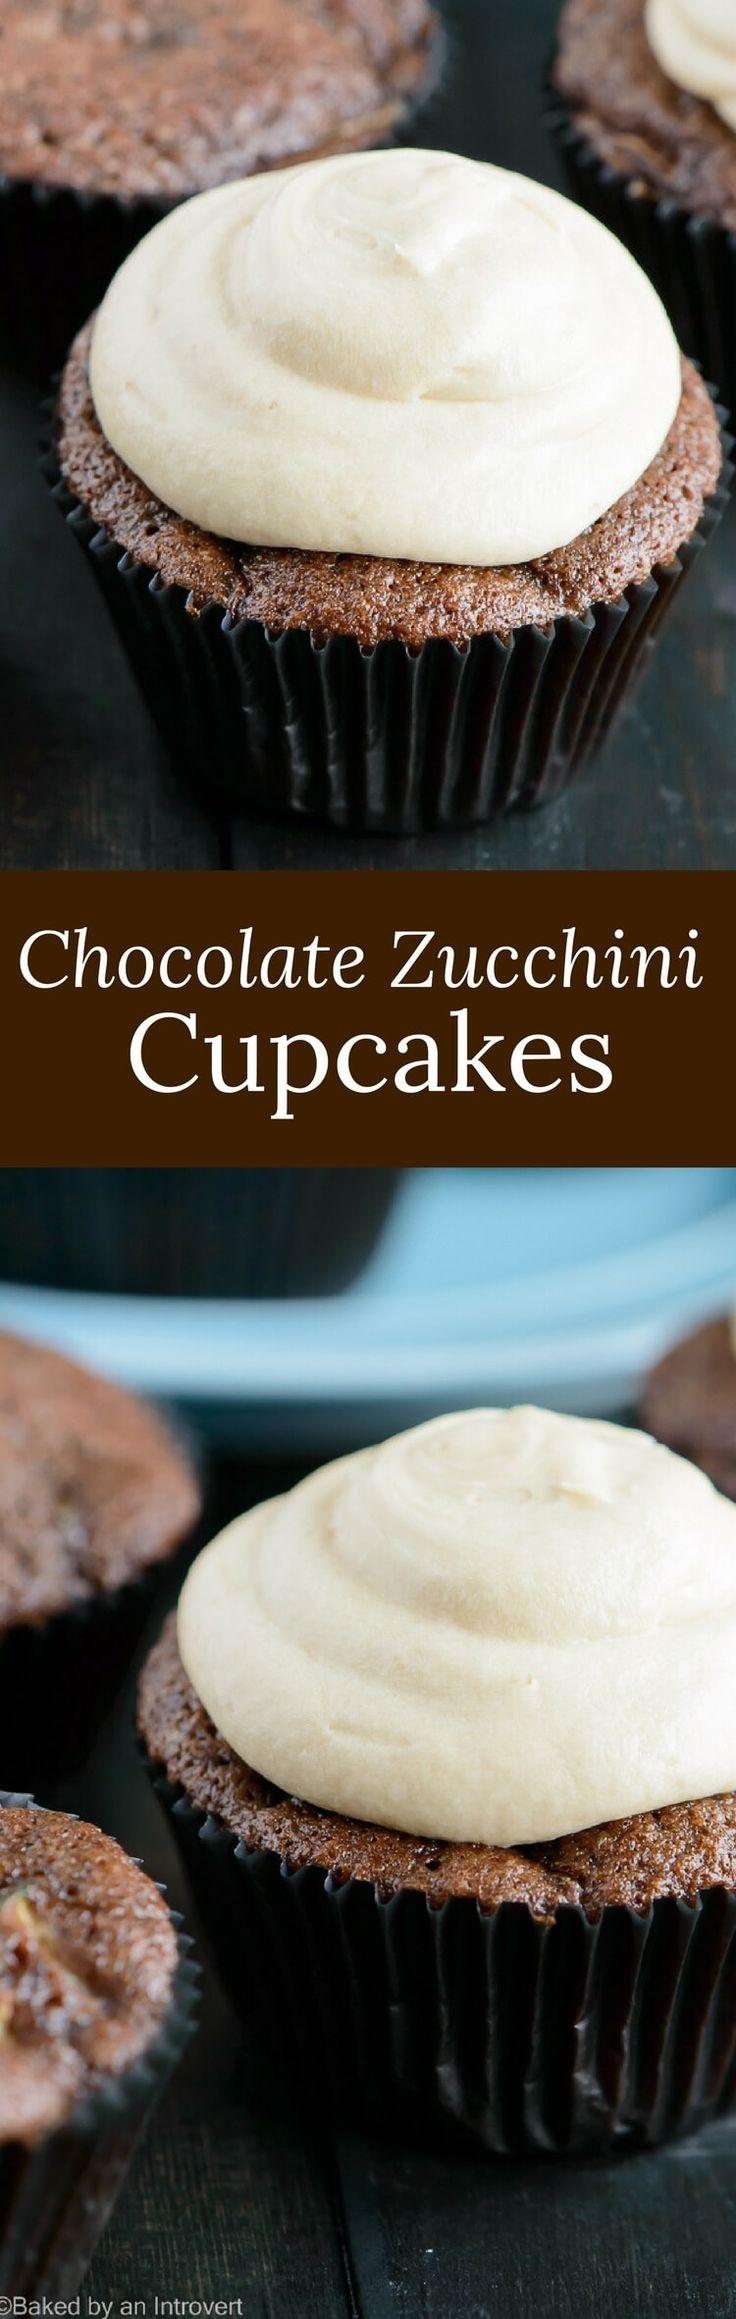 Chocolate Zucchini Cupcakes   Dessert   Cupcakes via @introvertbaker